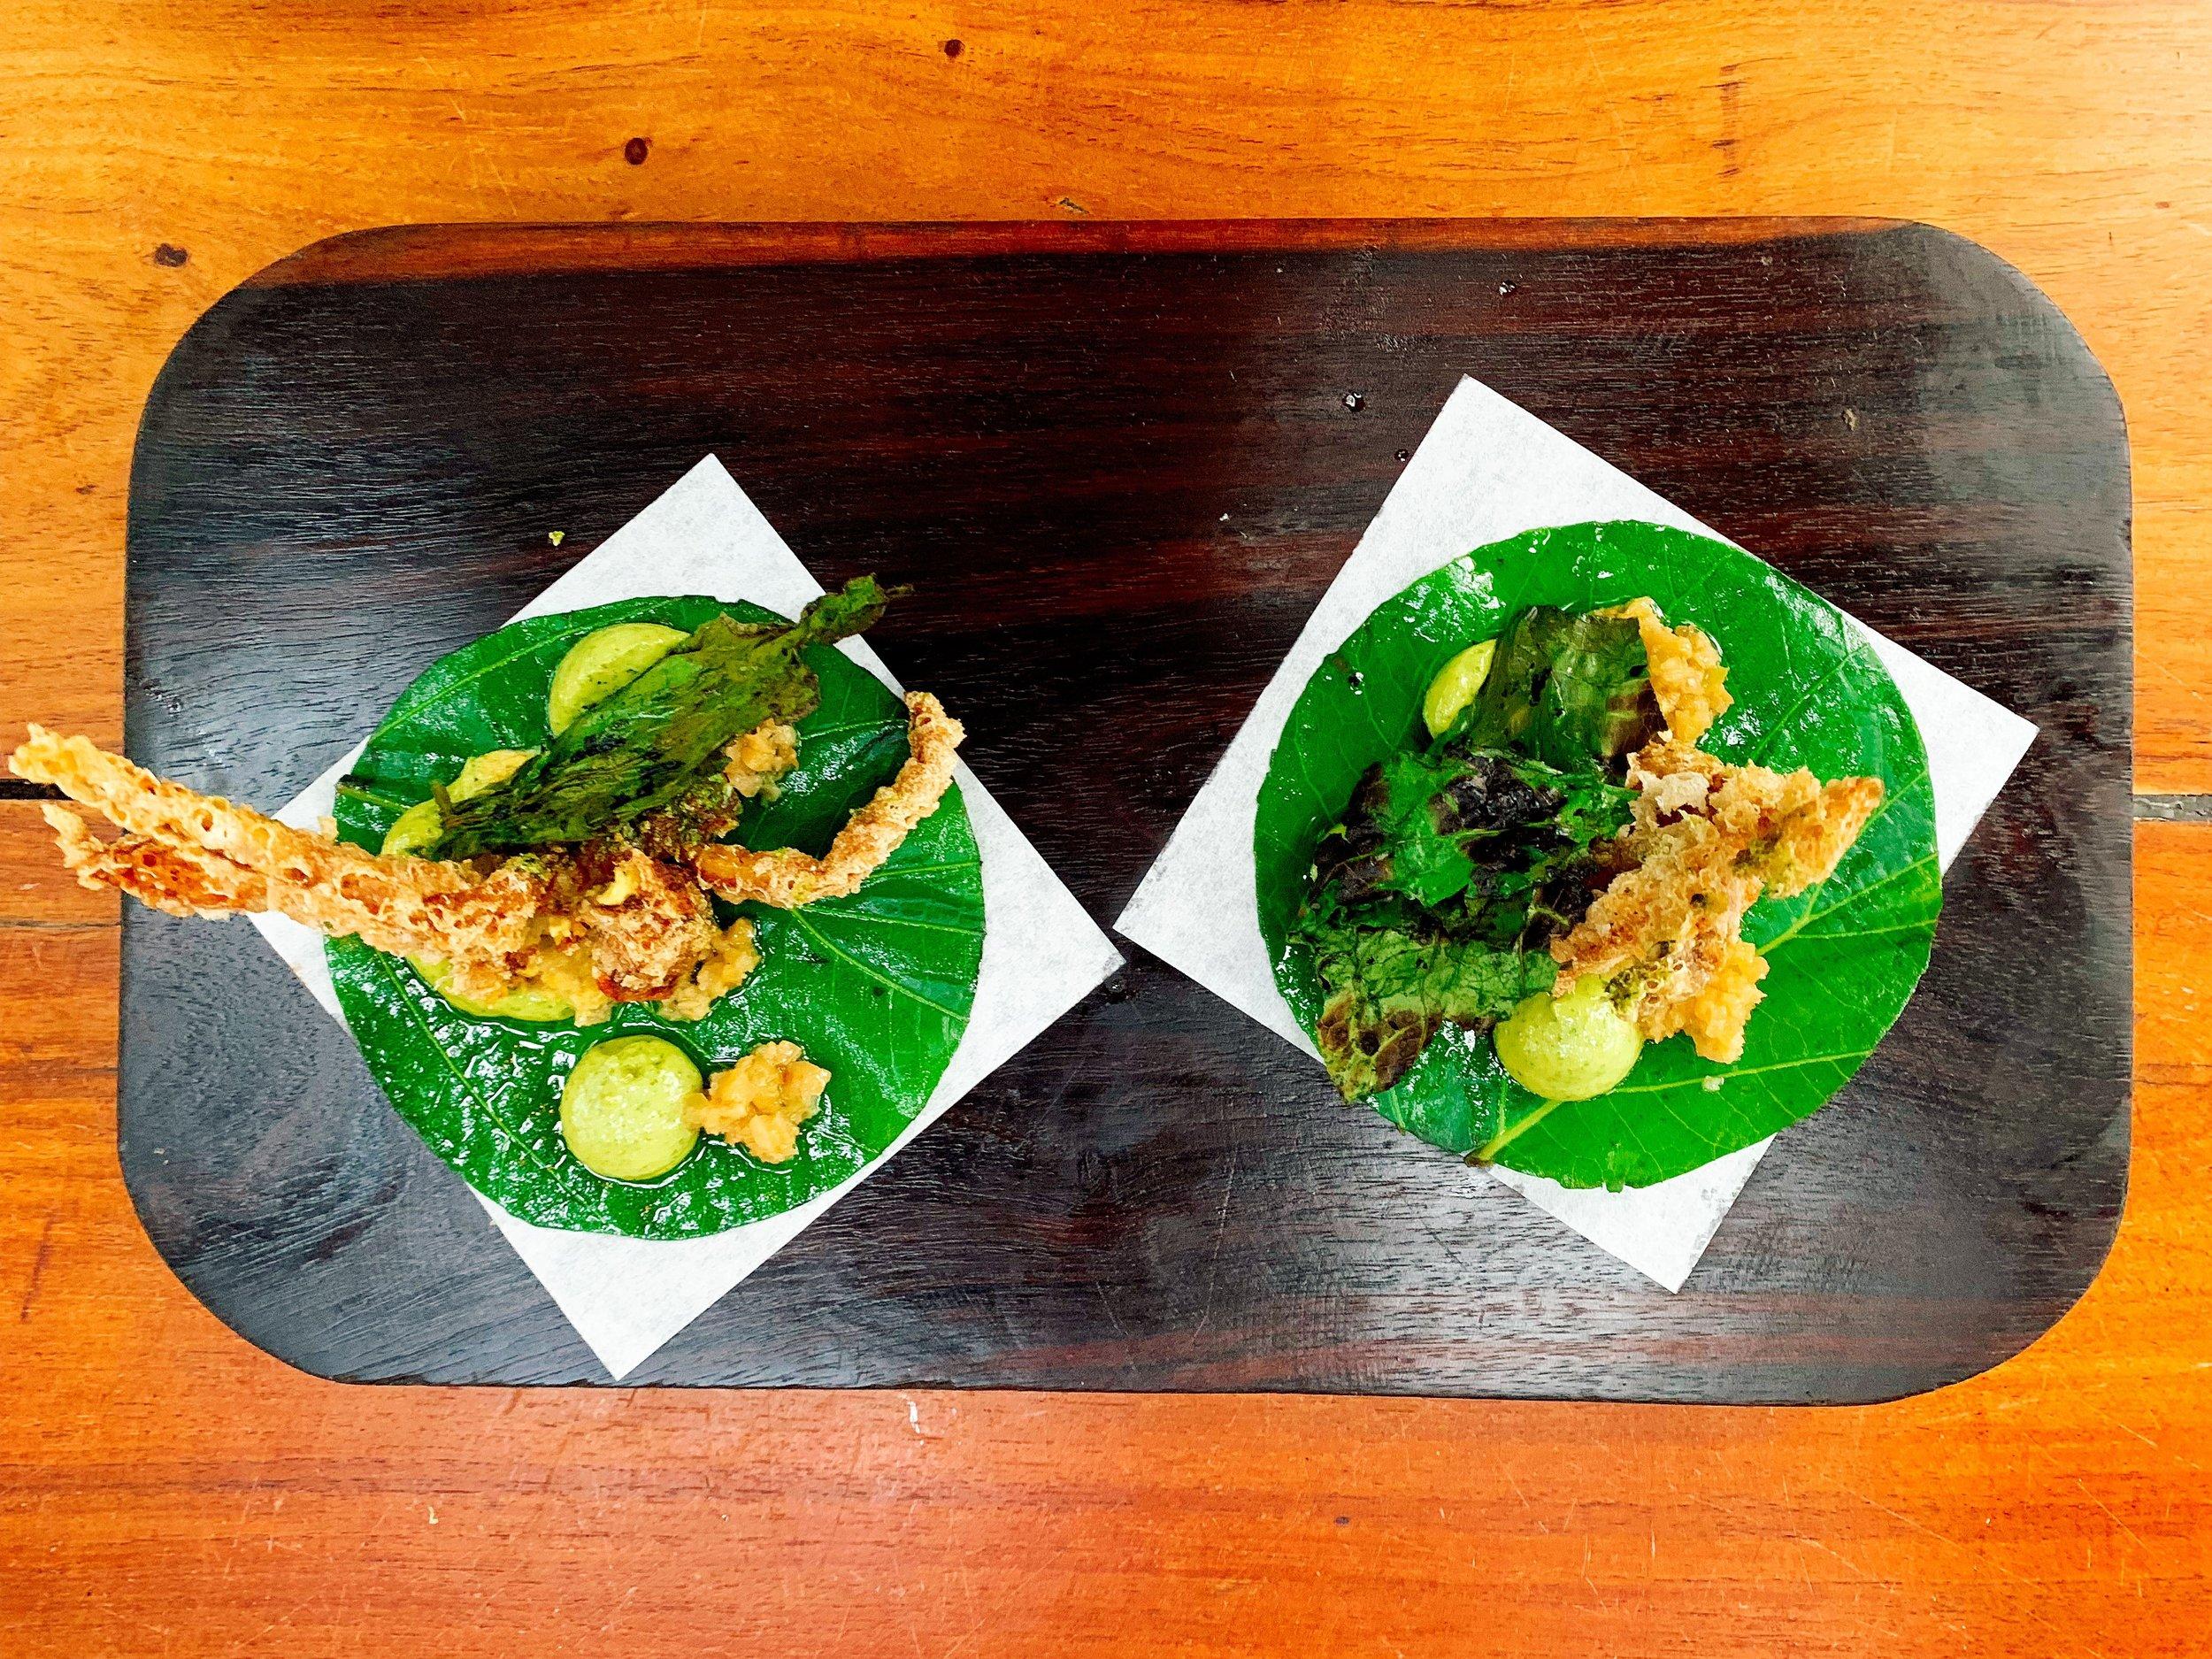 Soft Shelled Crab In Amaranth Tempura Tacos + Grosella And Pickled Habanero Salsa + Hojo Santa Emulsion + Grilled Hojo Santa